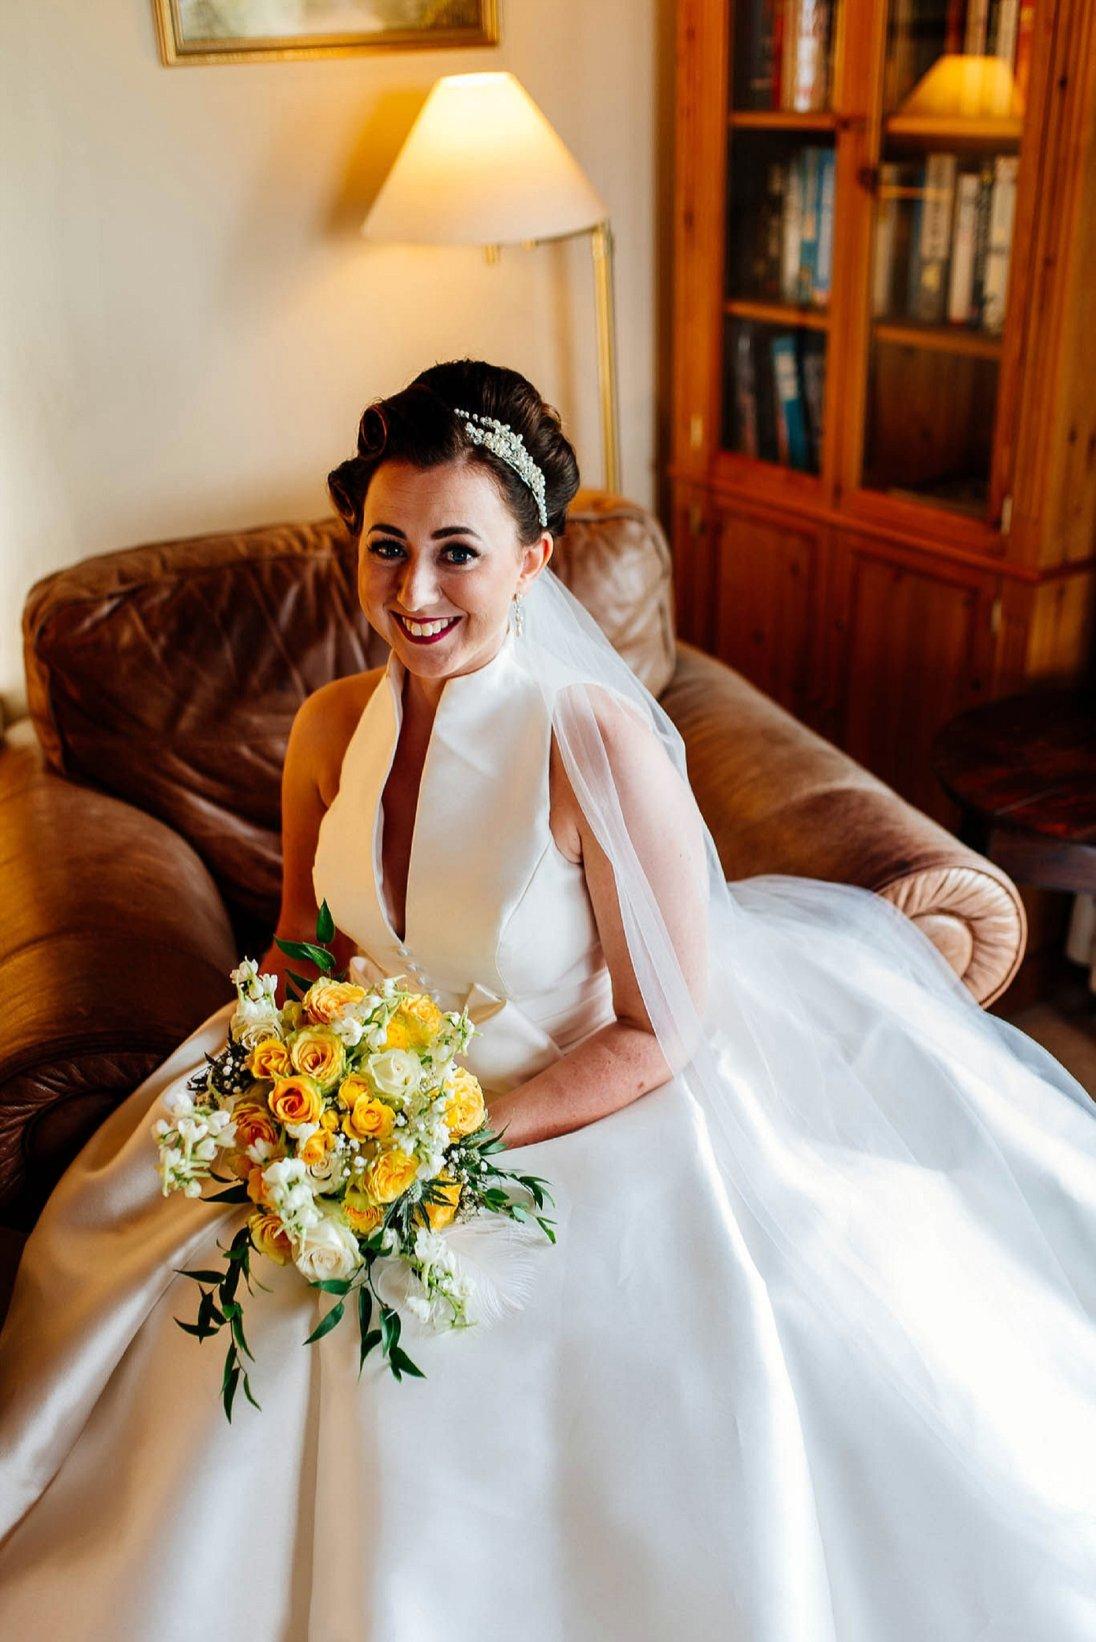 A Stylish Wedding at Alnwick Garden (c) Michal Ufniak (30)